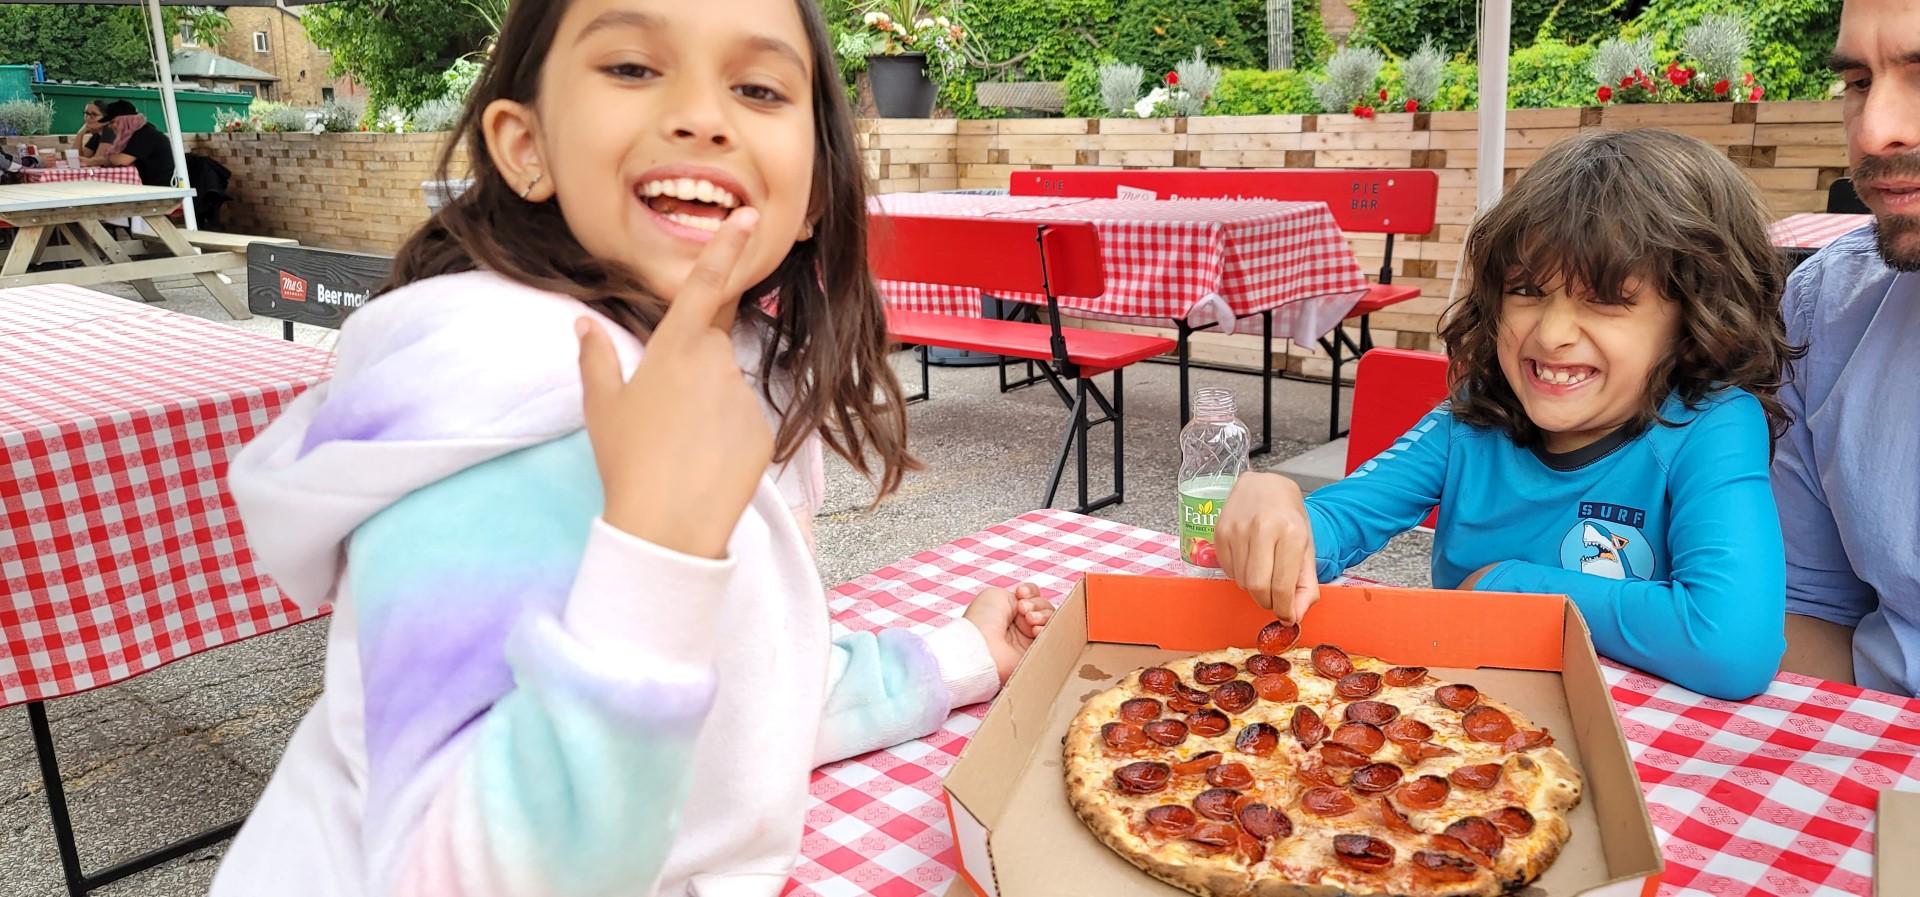 kids smiling eating Pizza